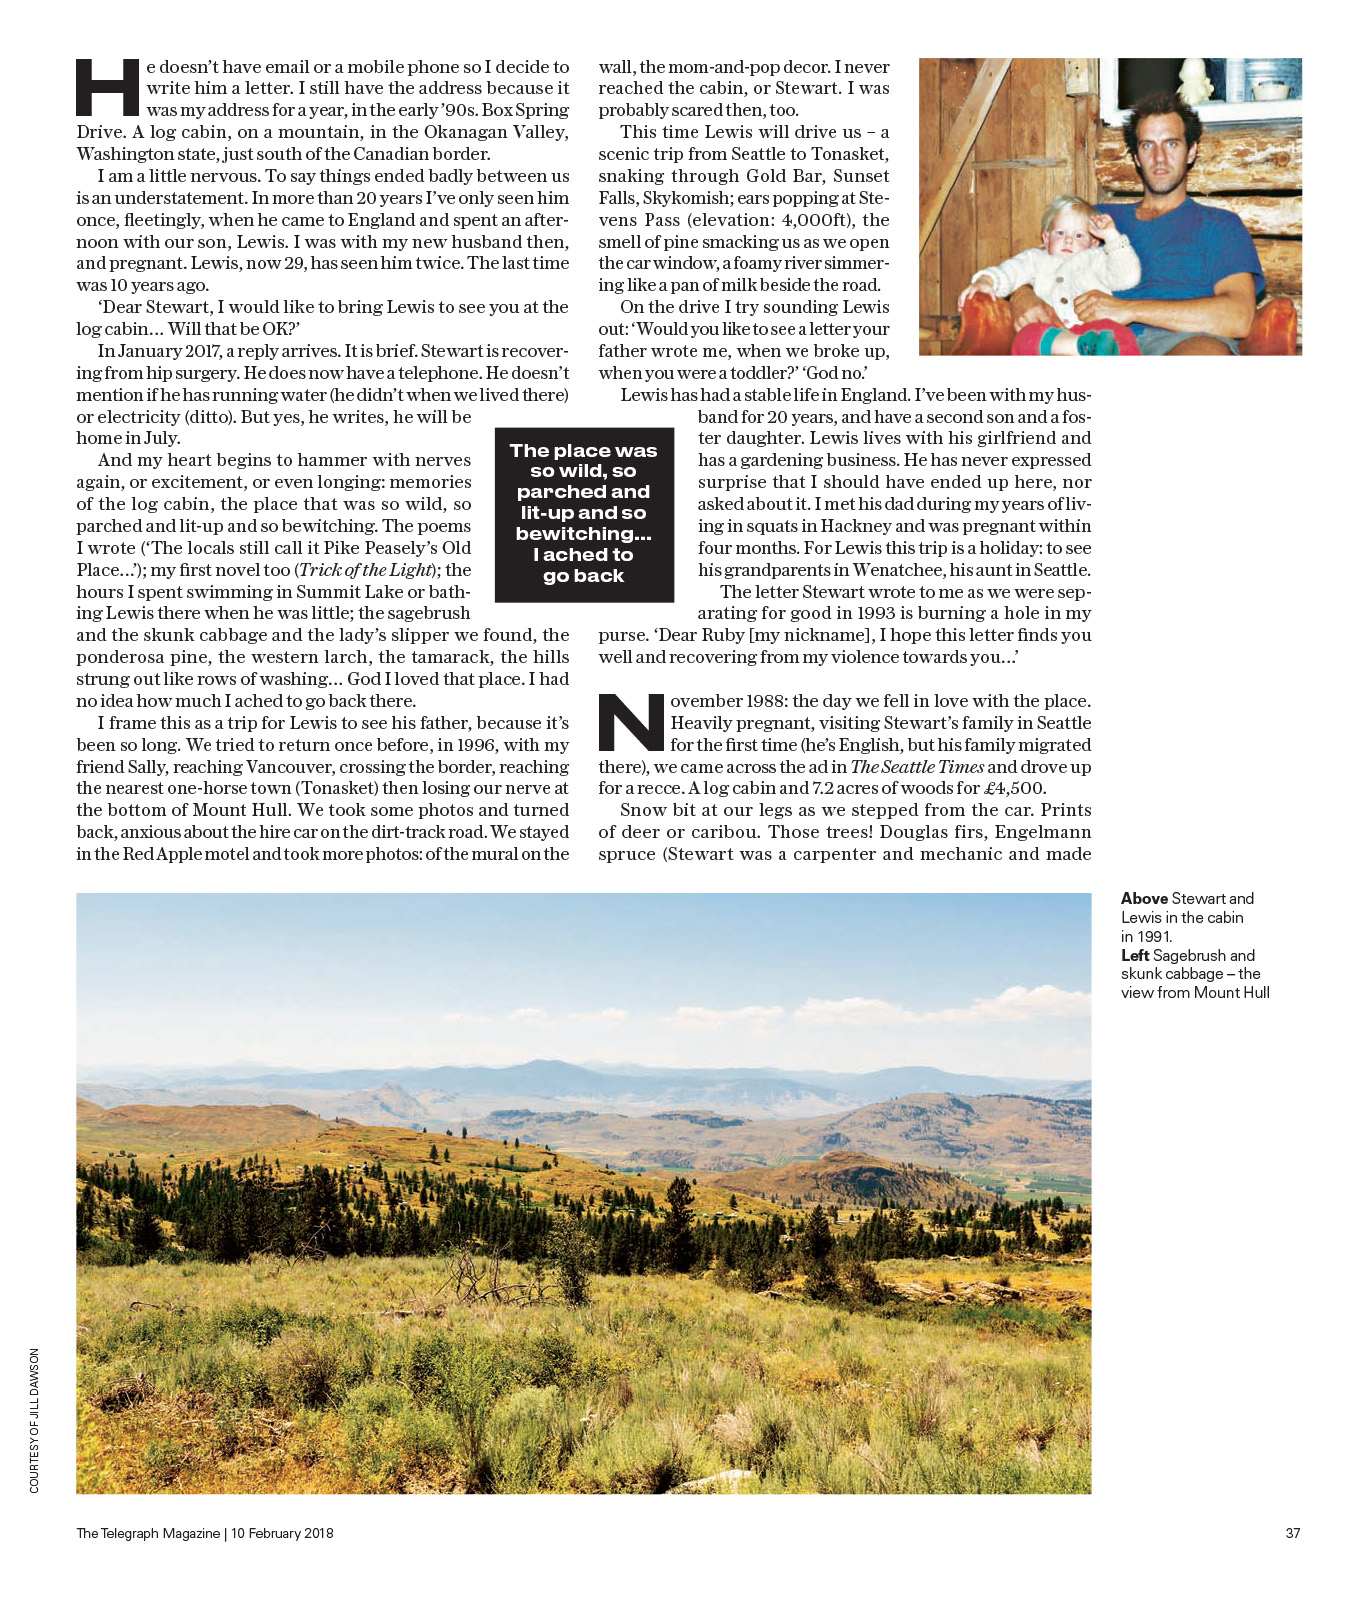 Jill Dawson story for Telegraph Magazine